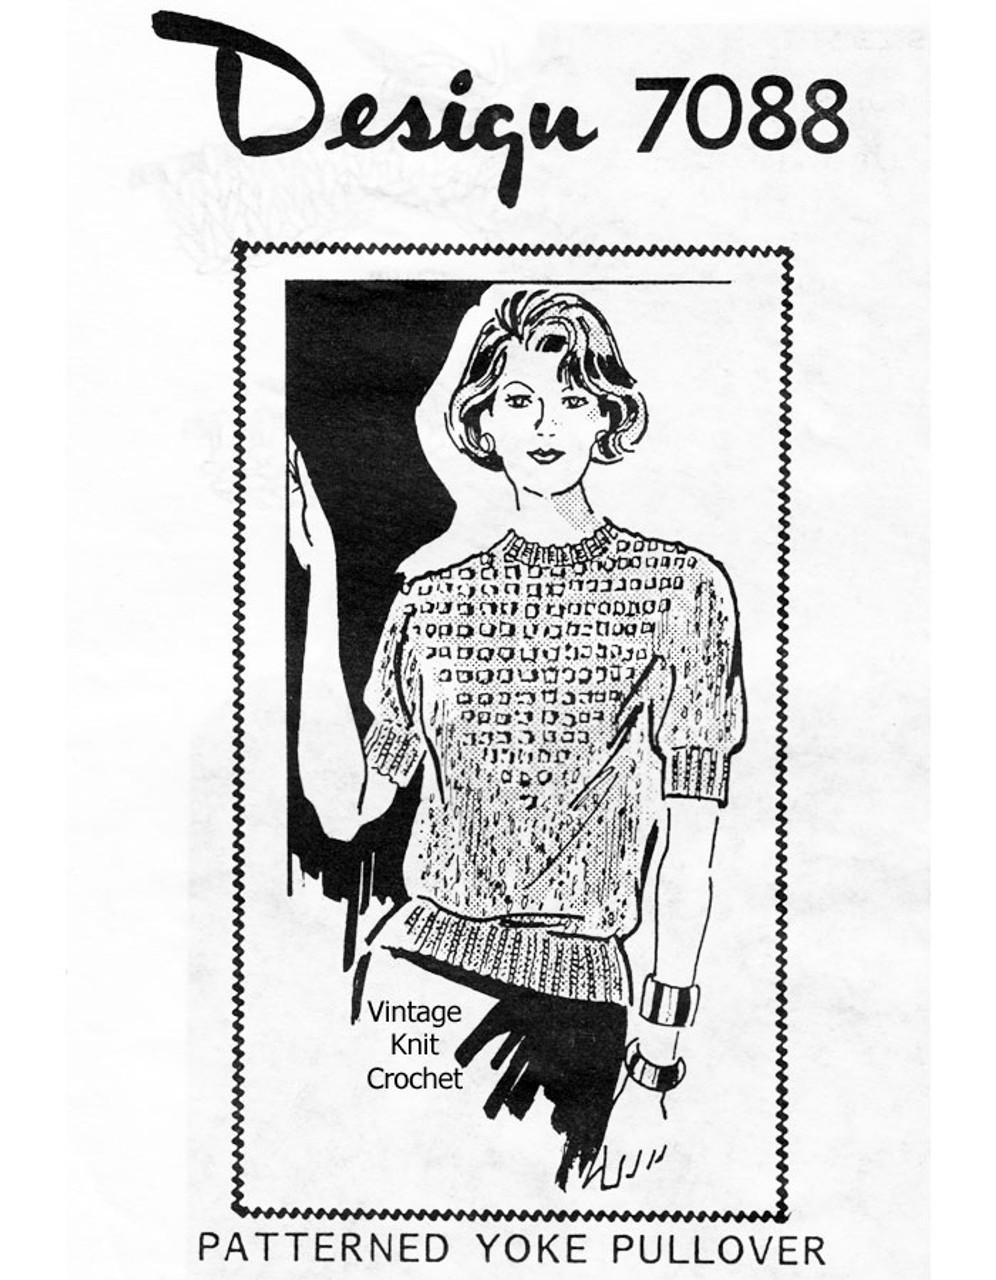 Diamond Knit Pullover Pattern Design 7088